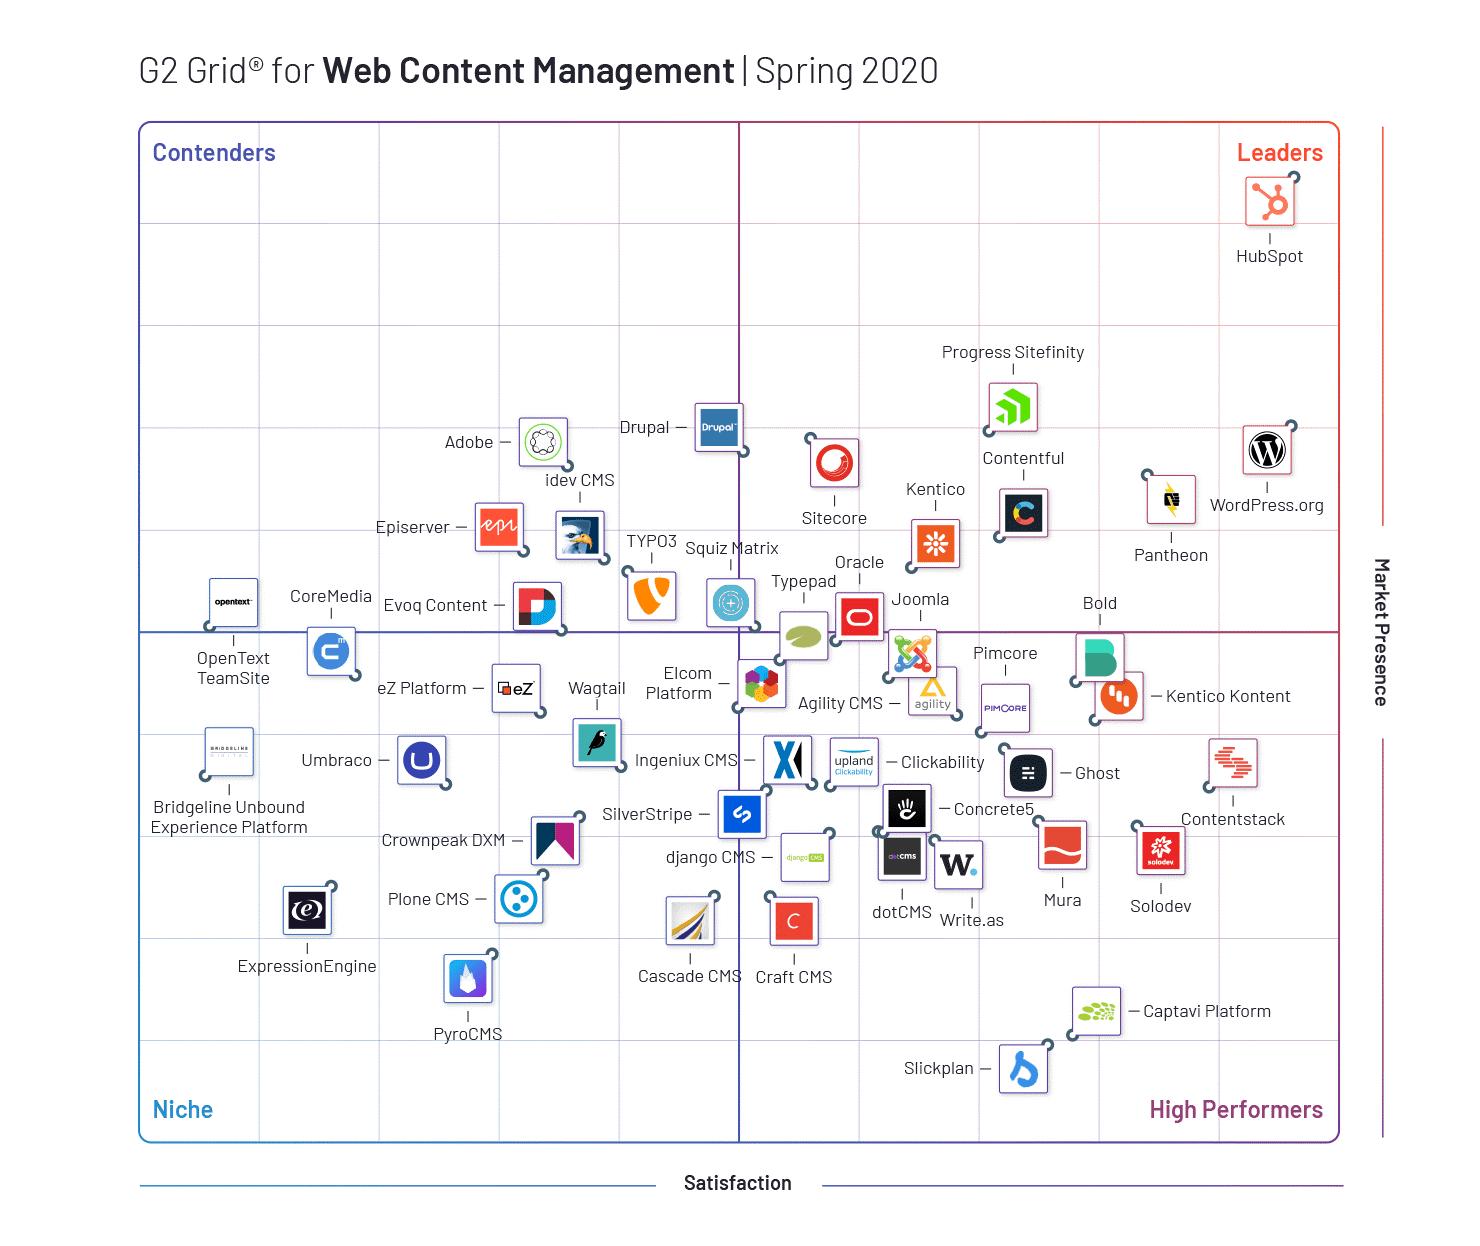 G2 Grid for Web Content Management